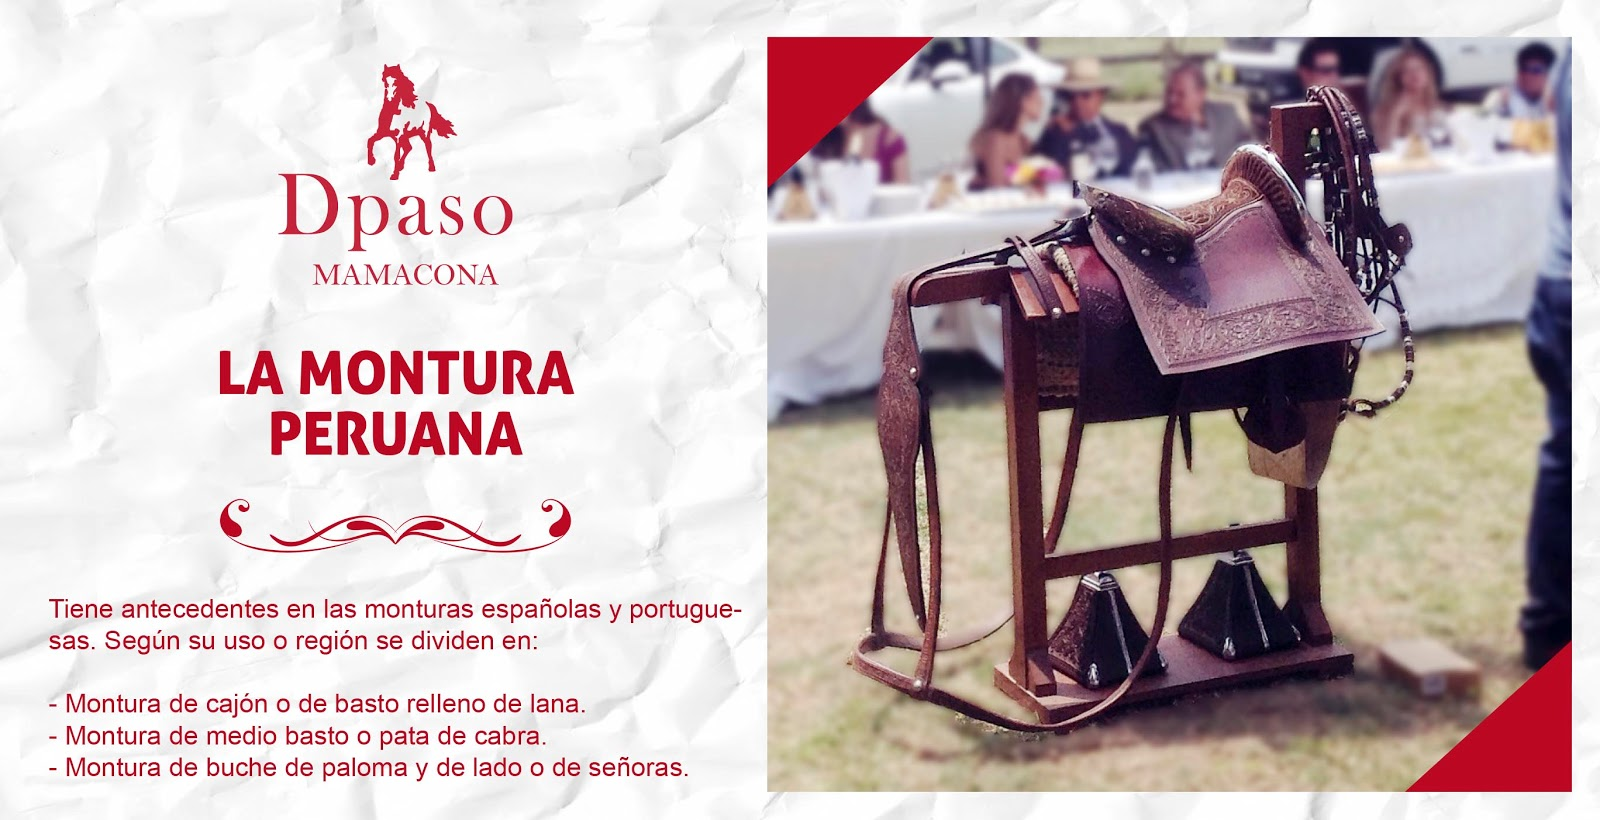 Dpaso caballo peruano de paso mamacona lima for Montura llave de paso